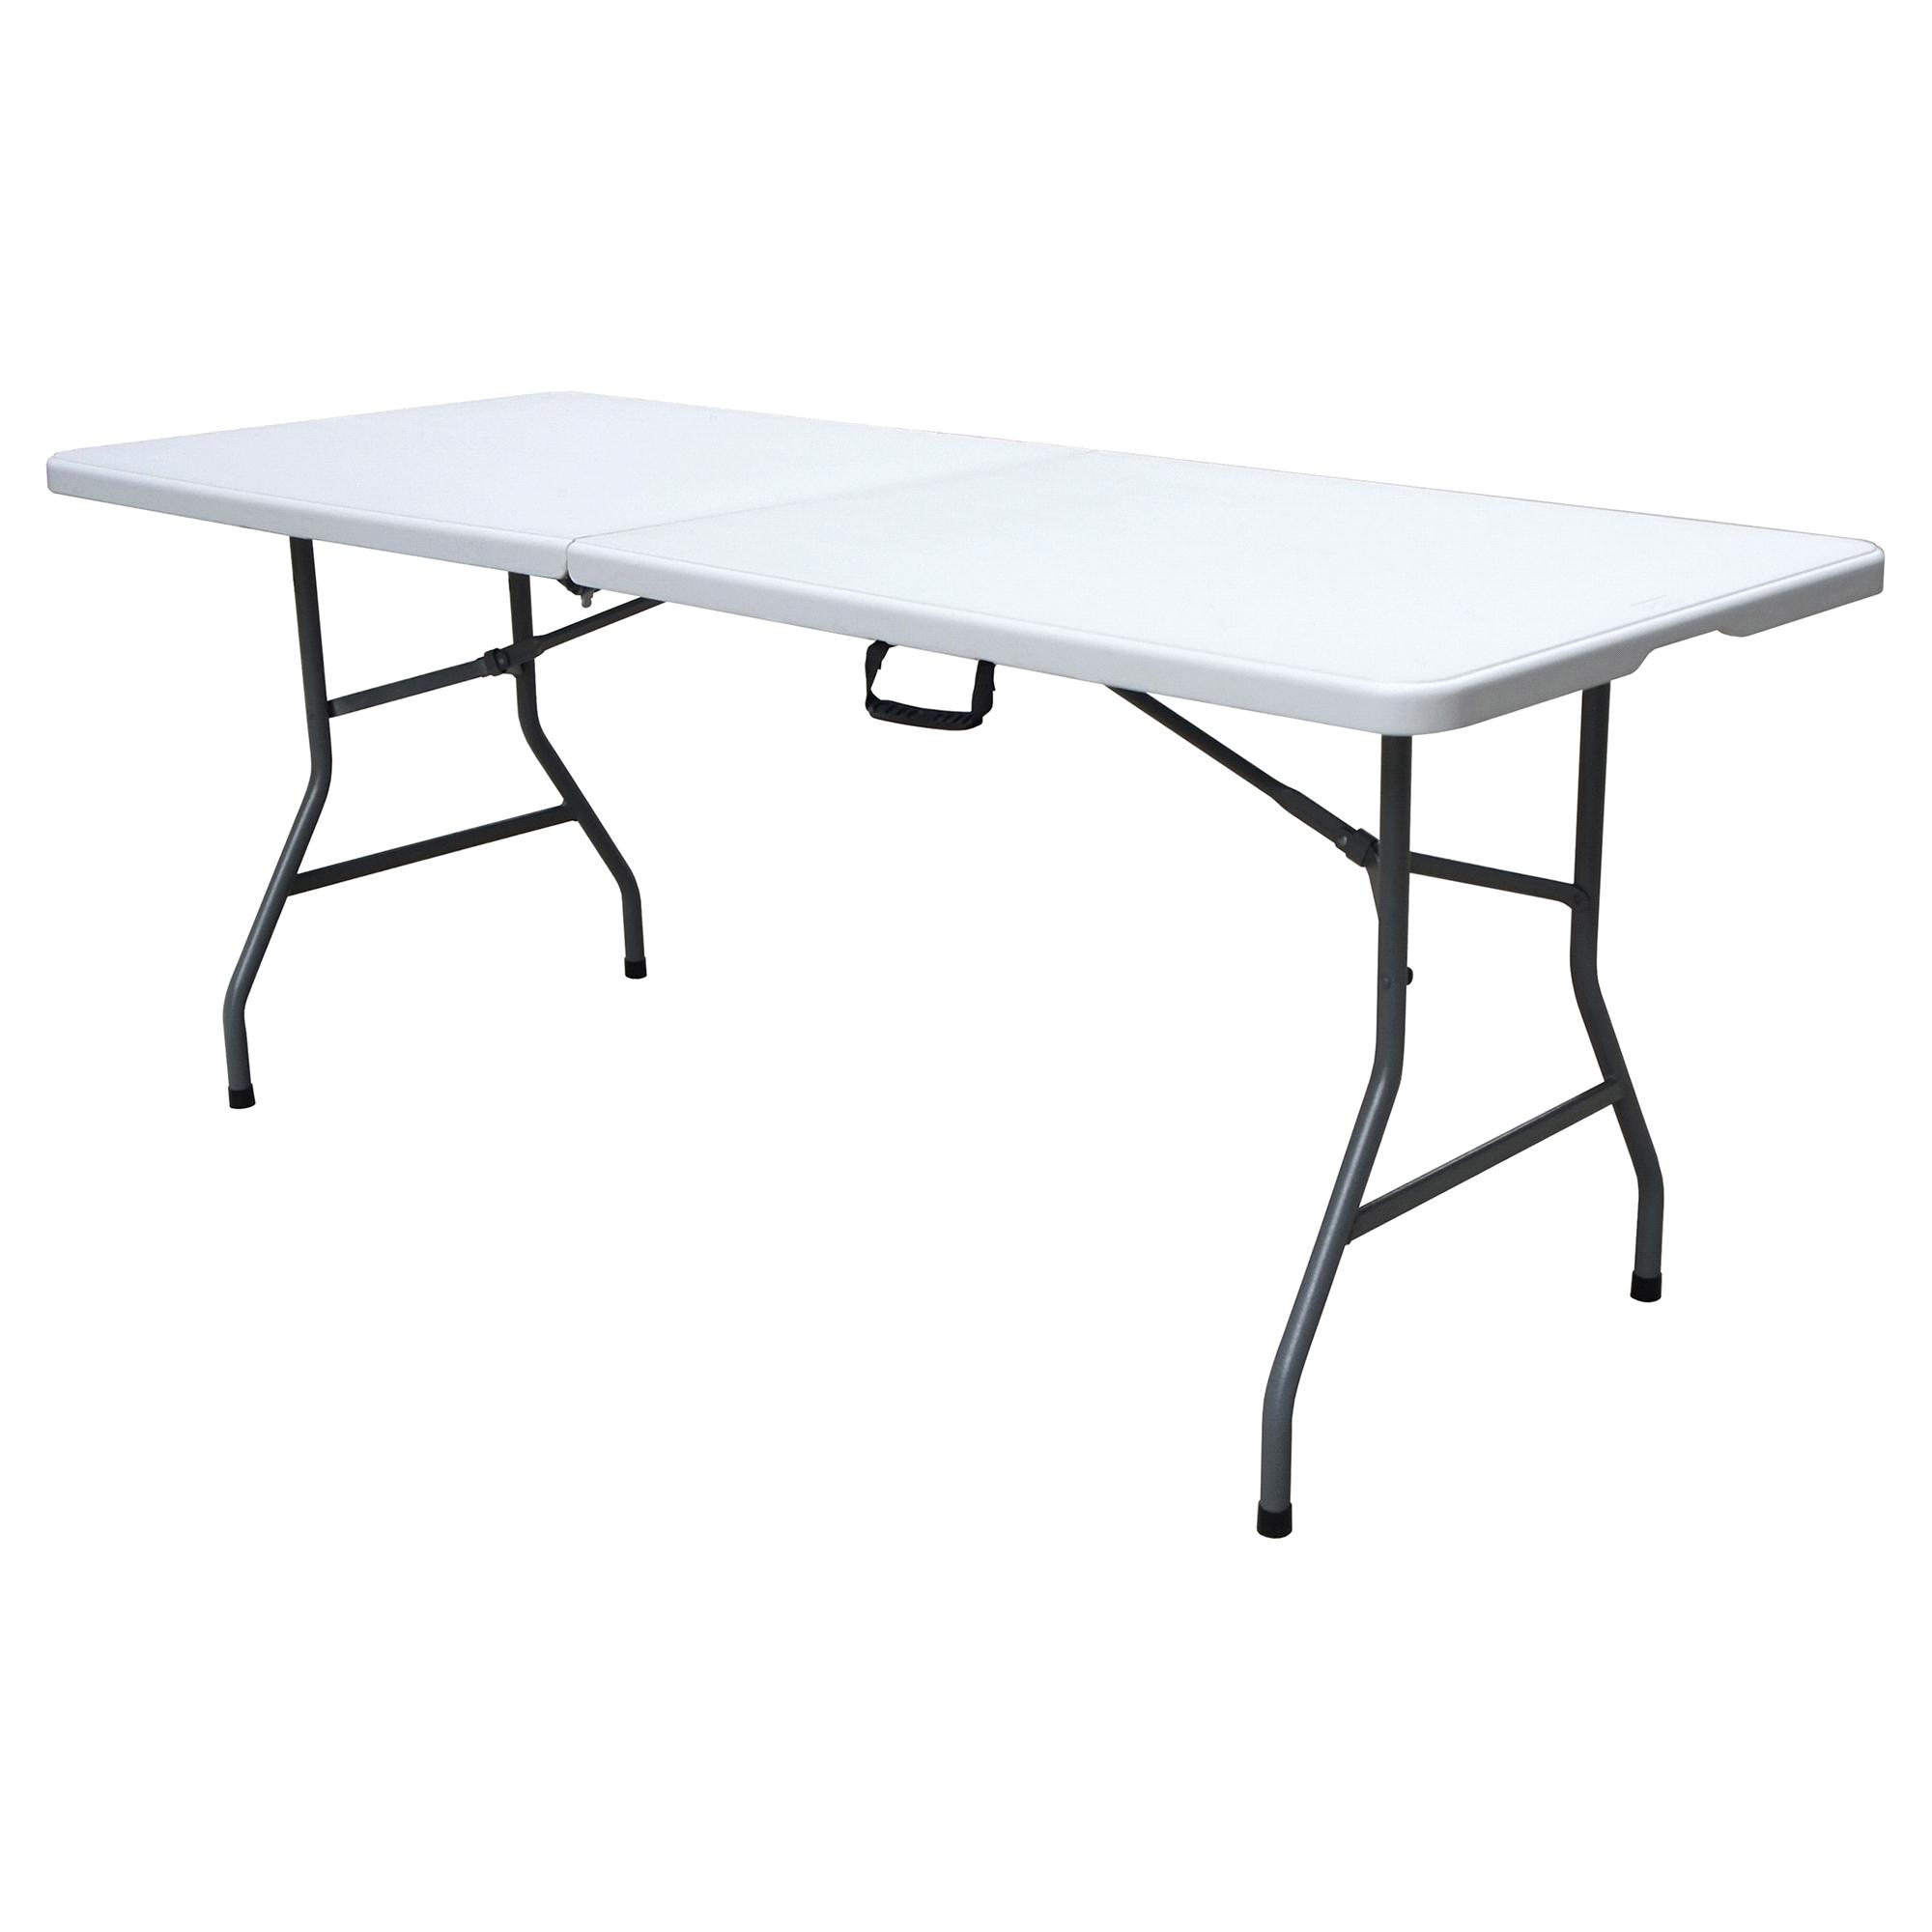 6 Fold In Half Table